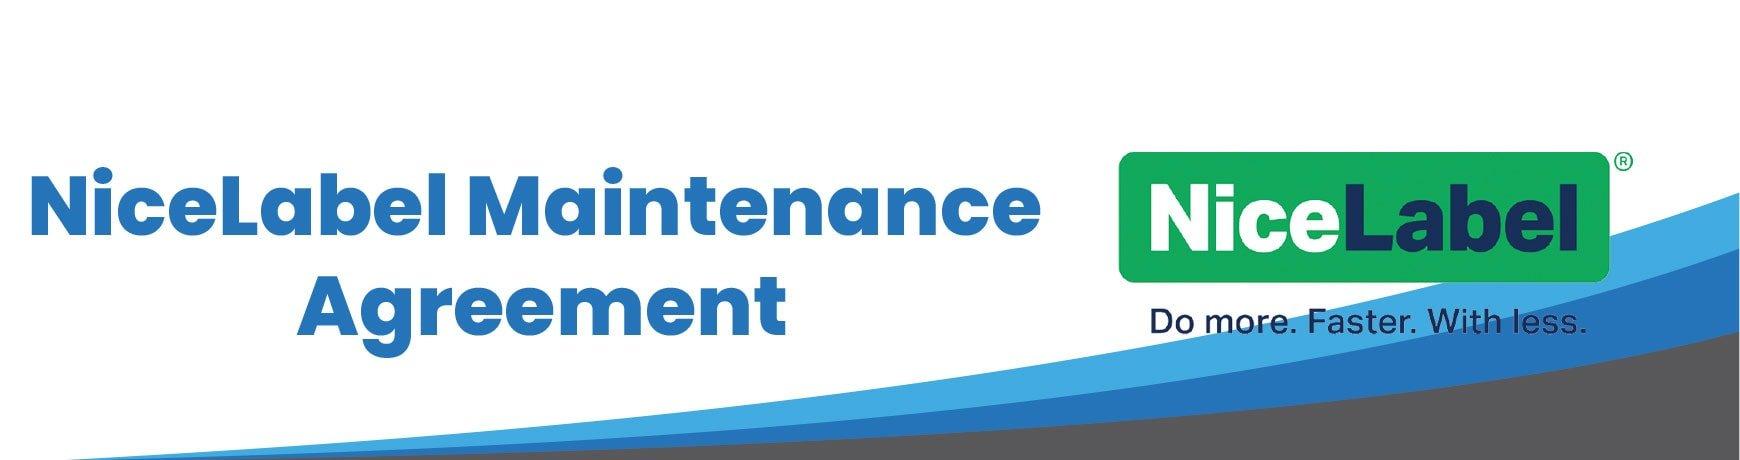 NiceLabel Maintenance Agreement